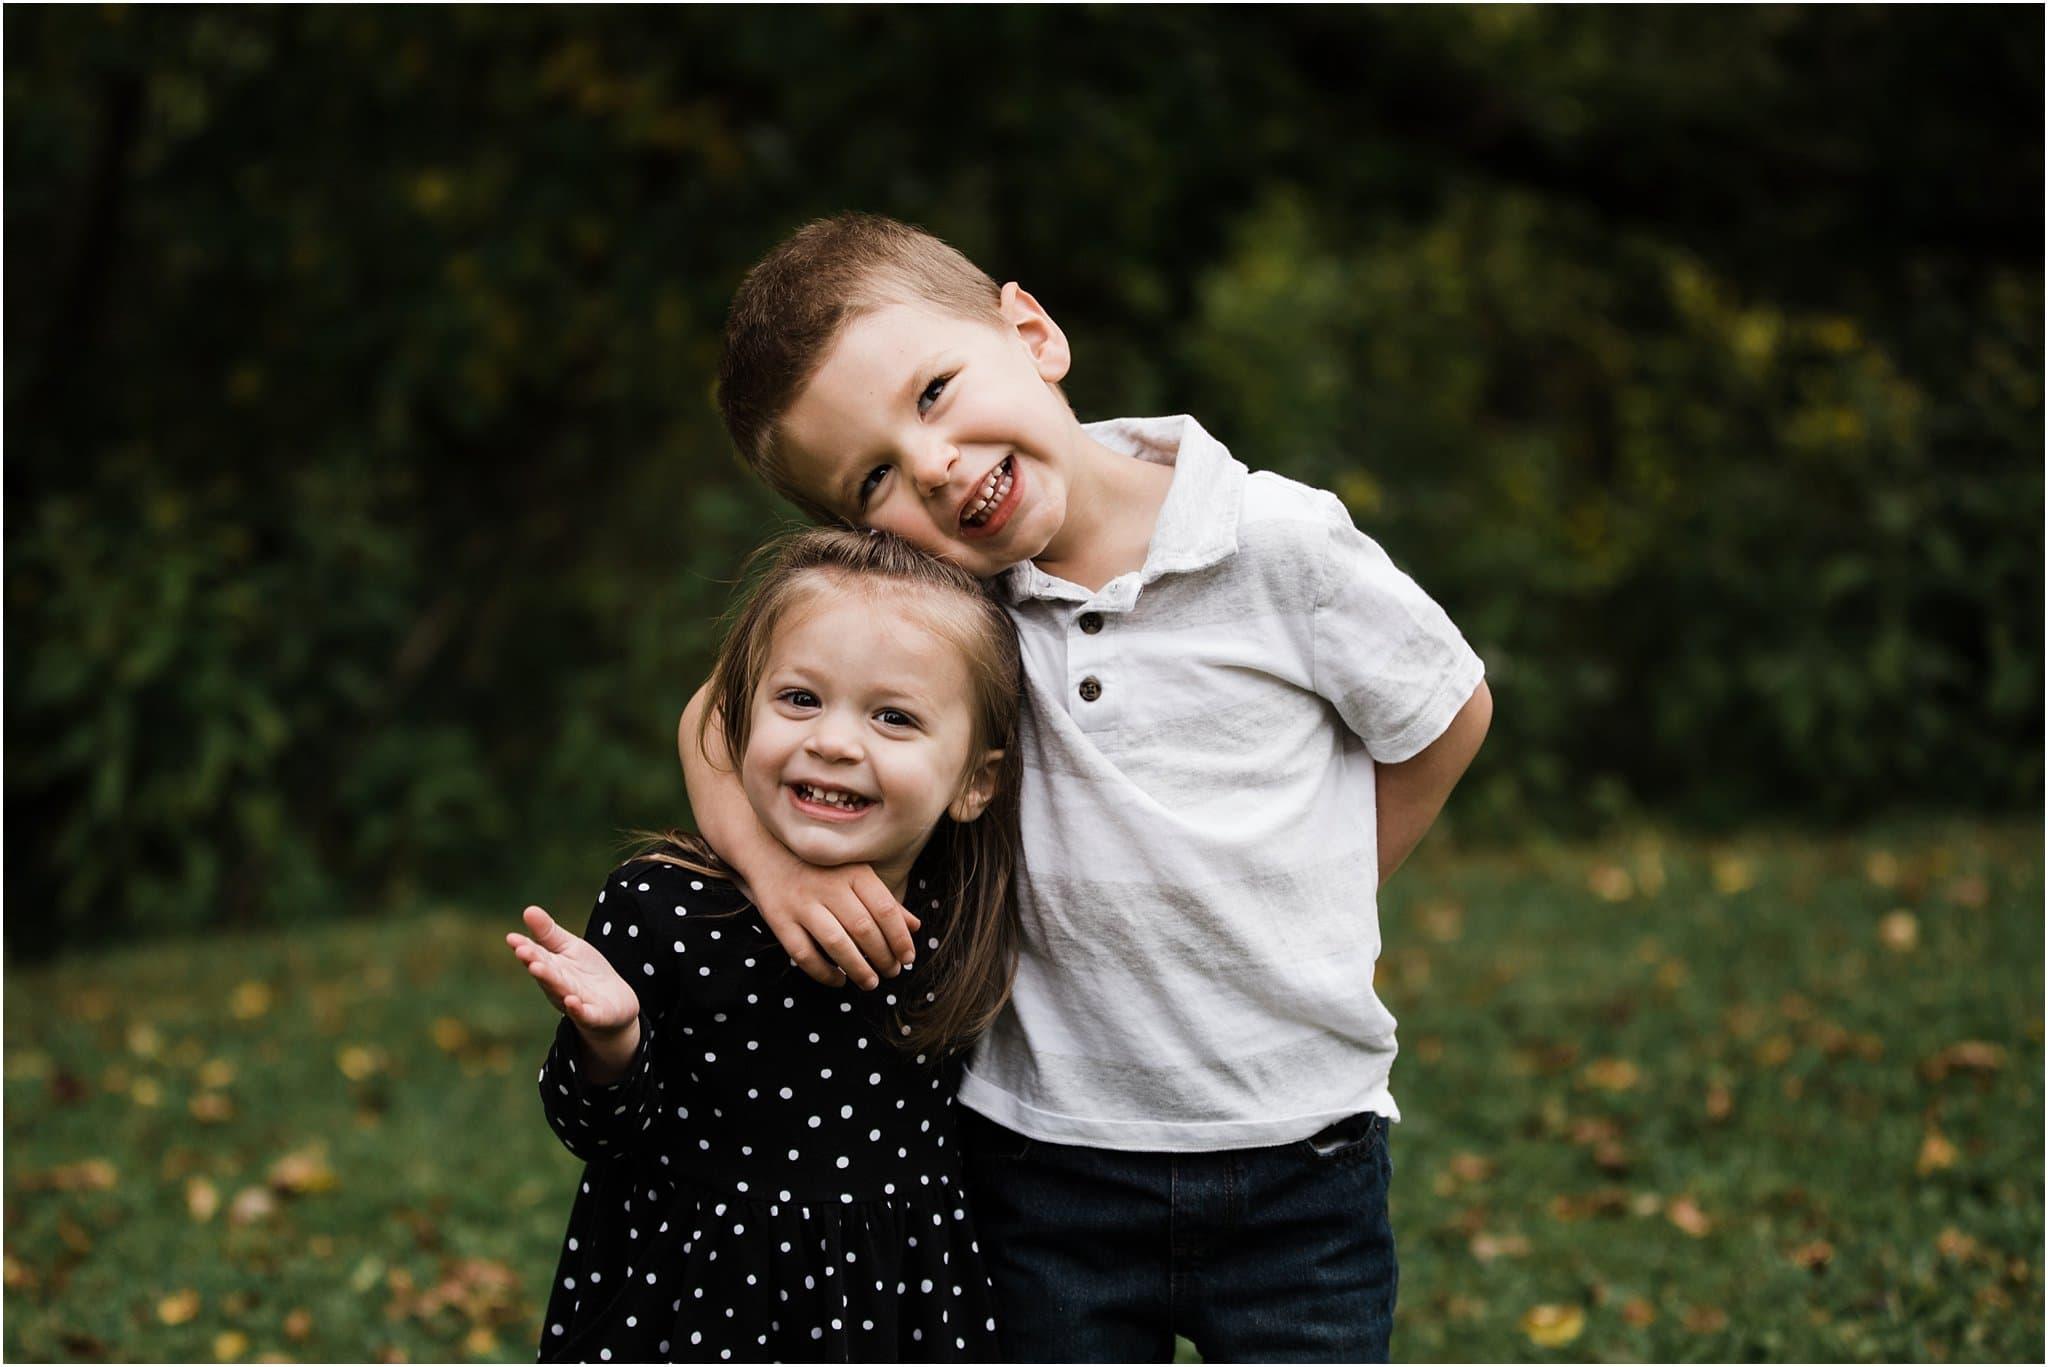 smiling siblings photo